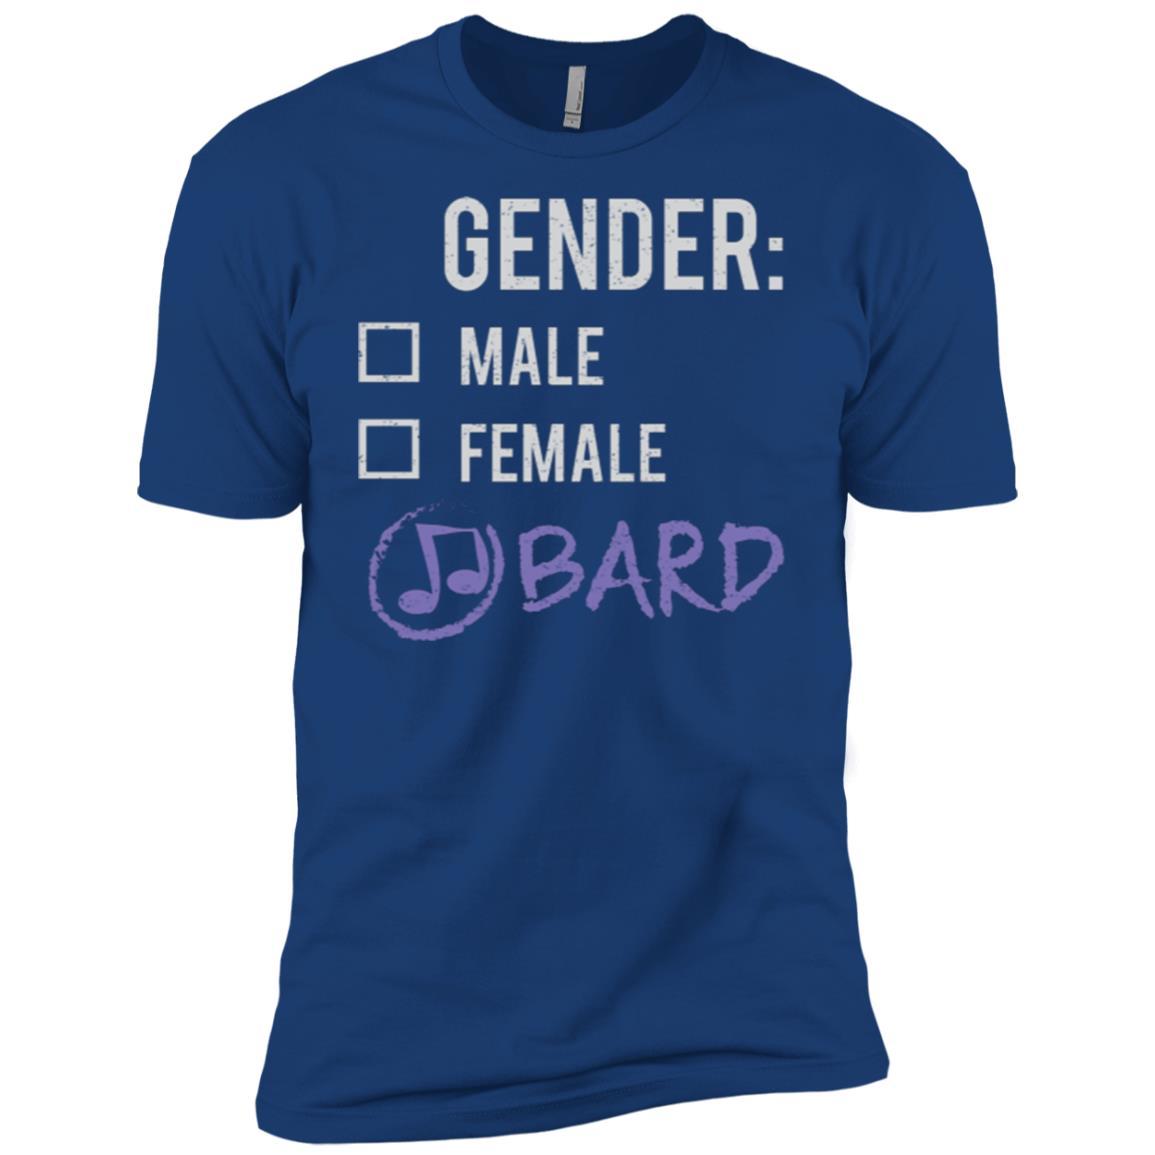 Male Female Bard Gender Nonbinary Trans Men Short Sleeve T-Shirt